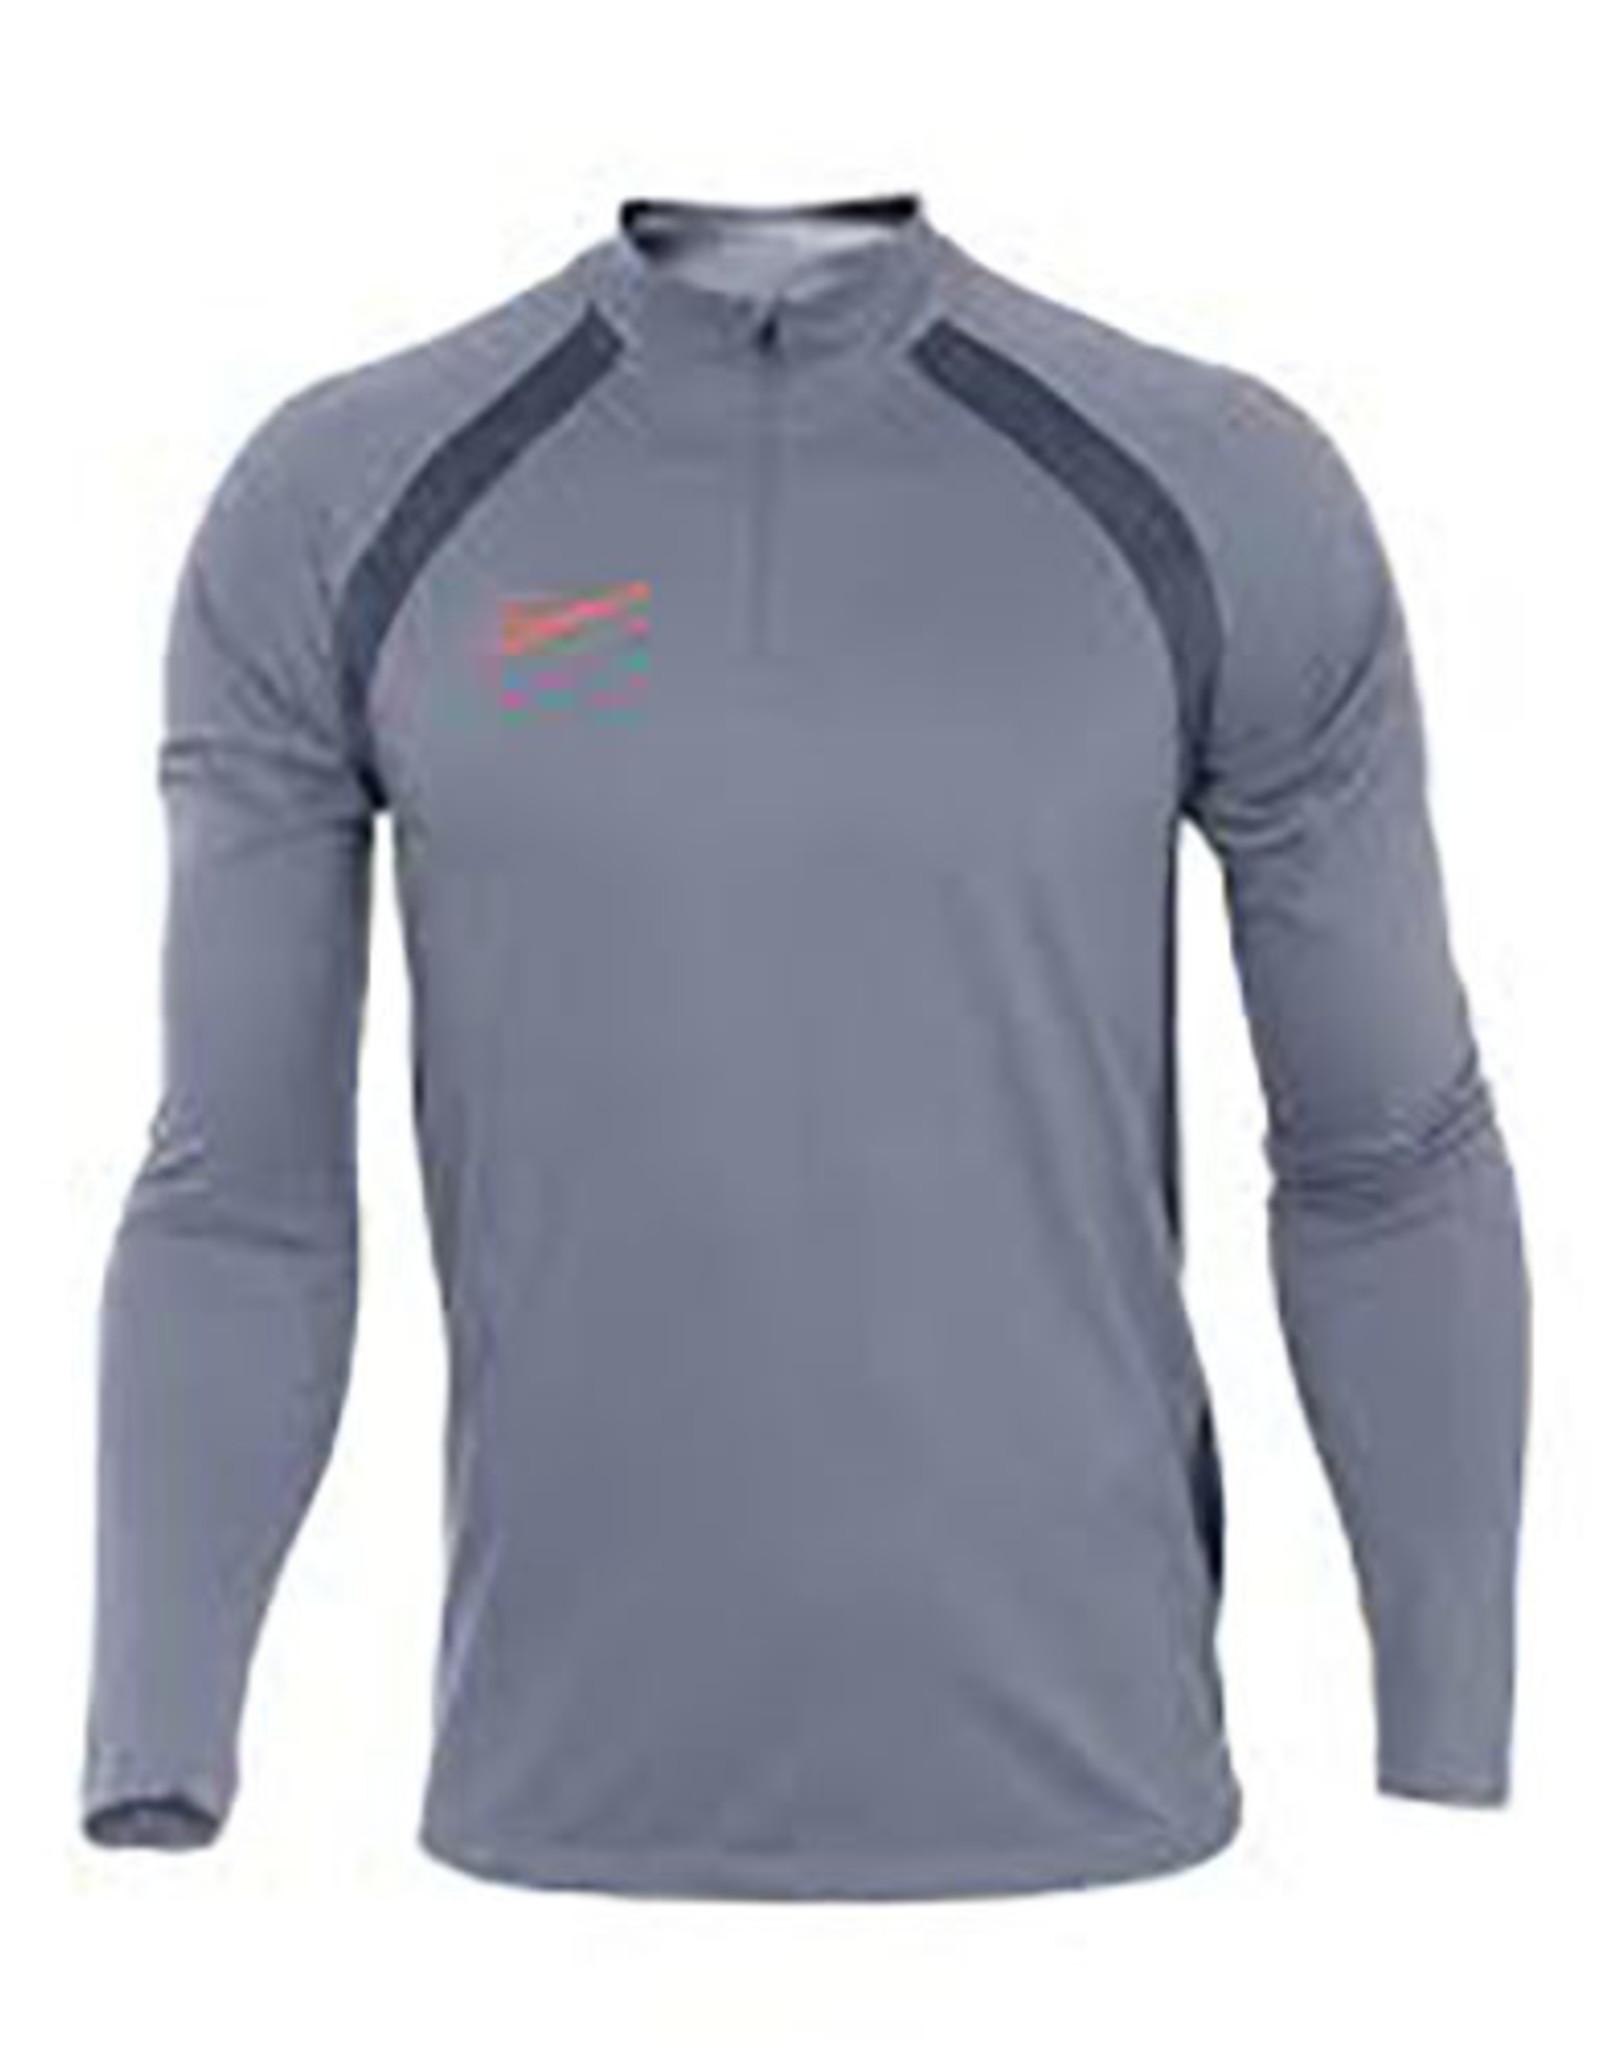 Nike Nike ziptop aq1245